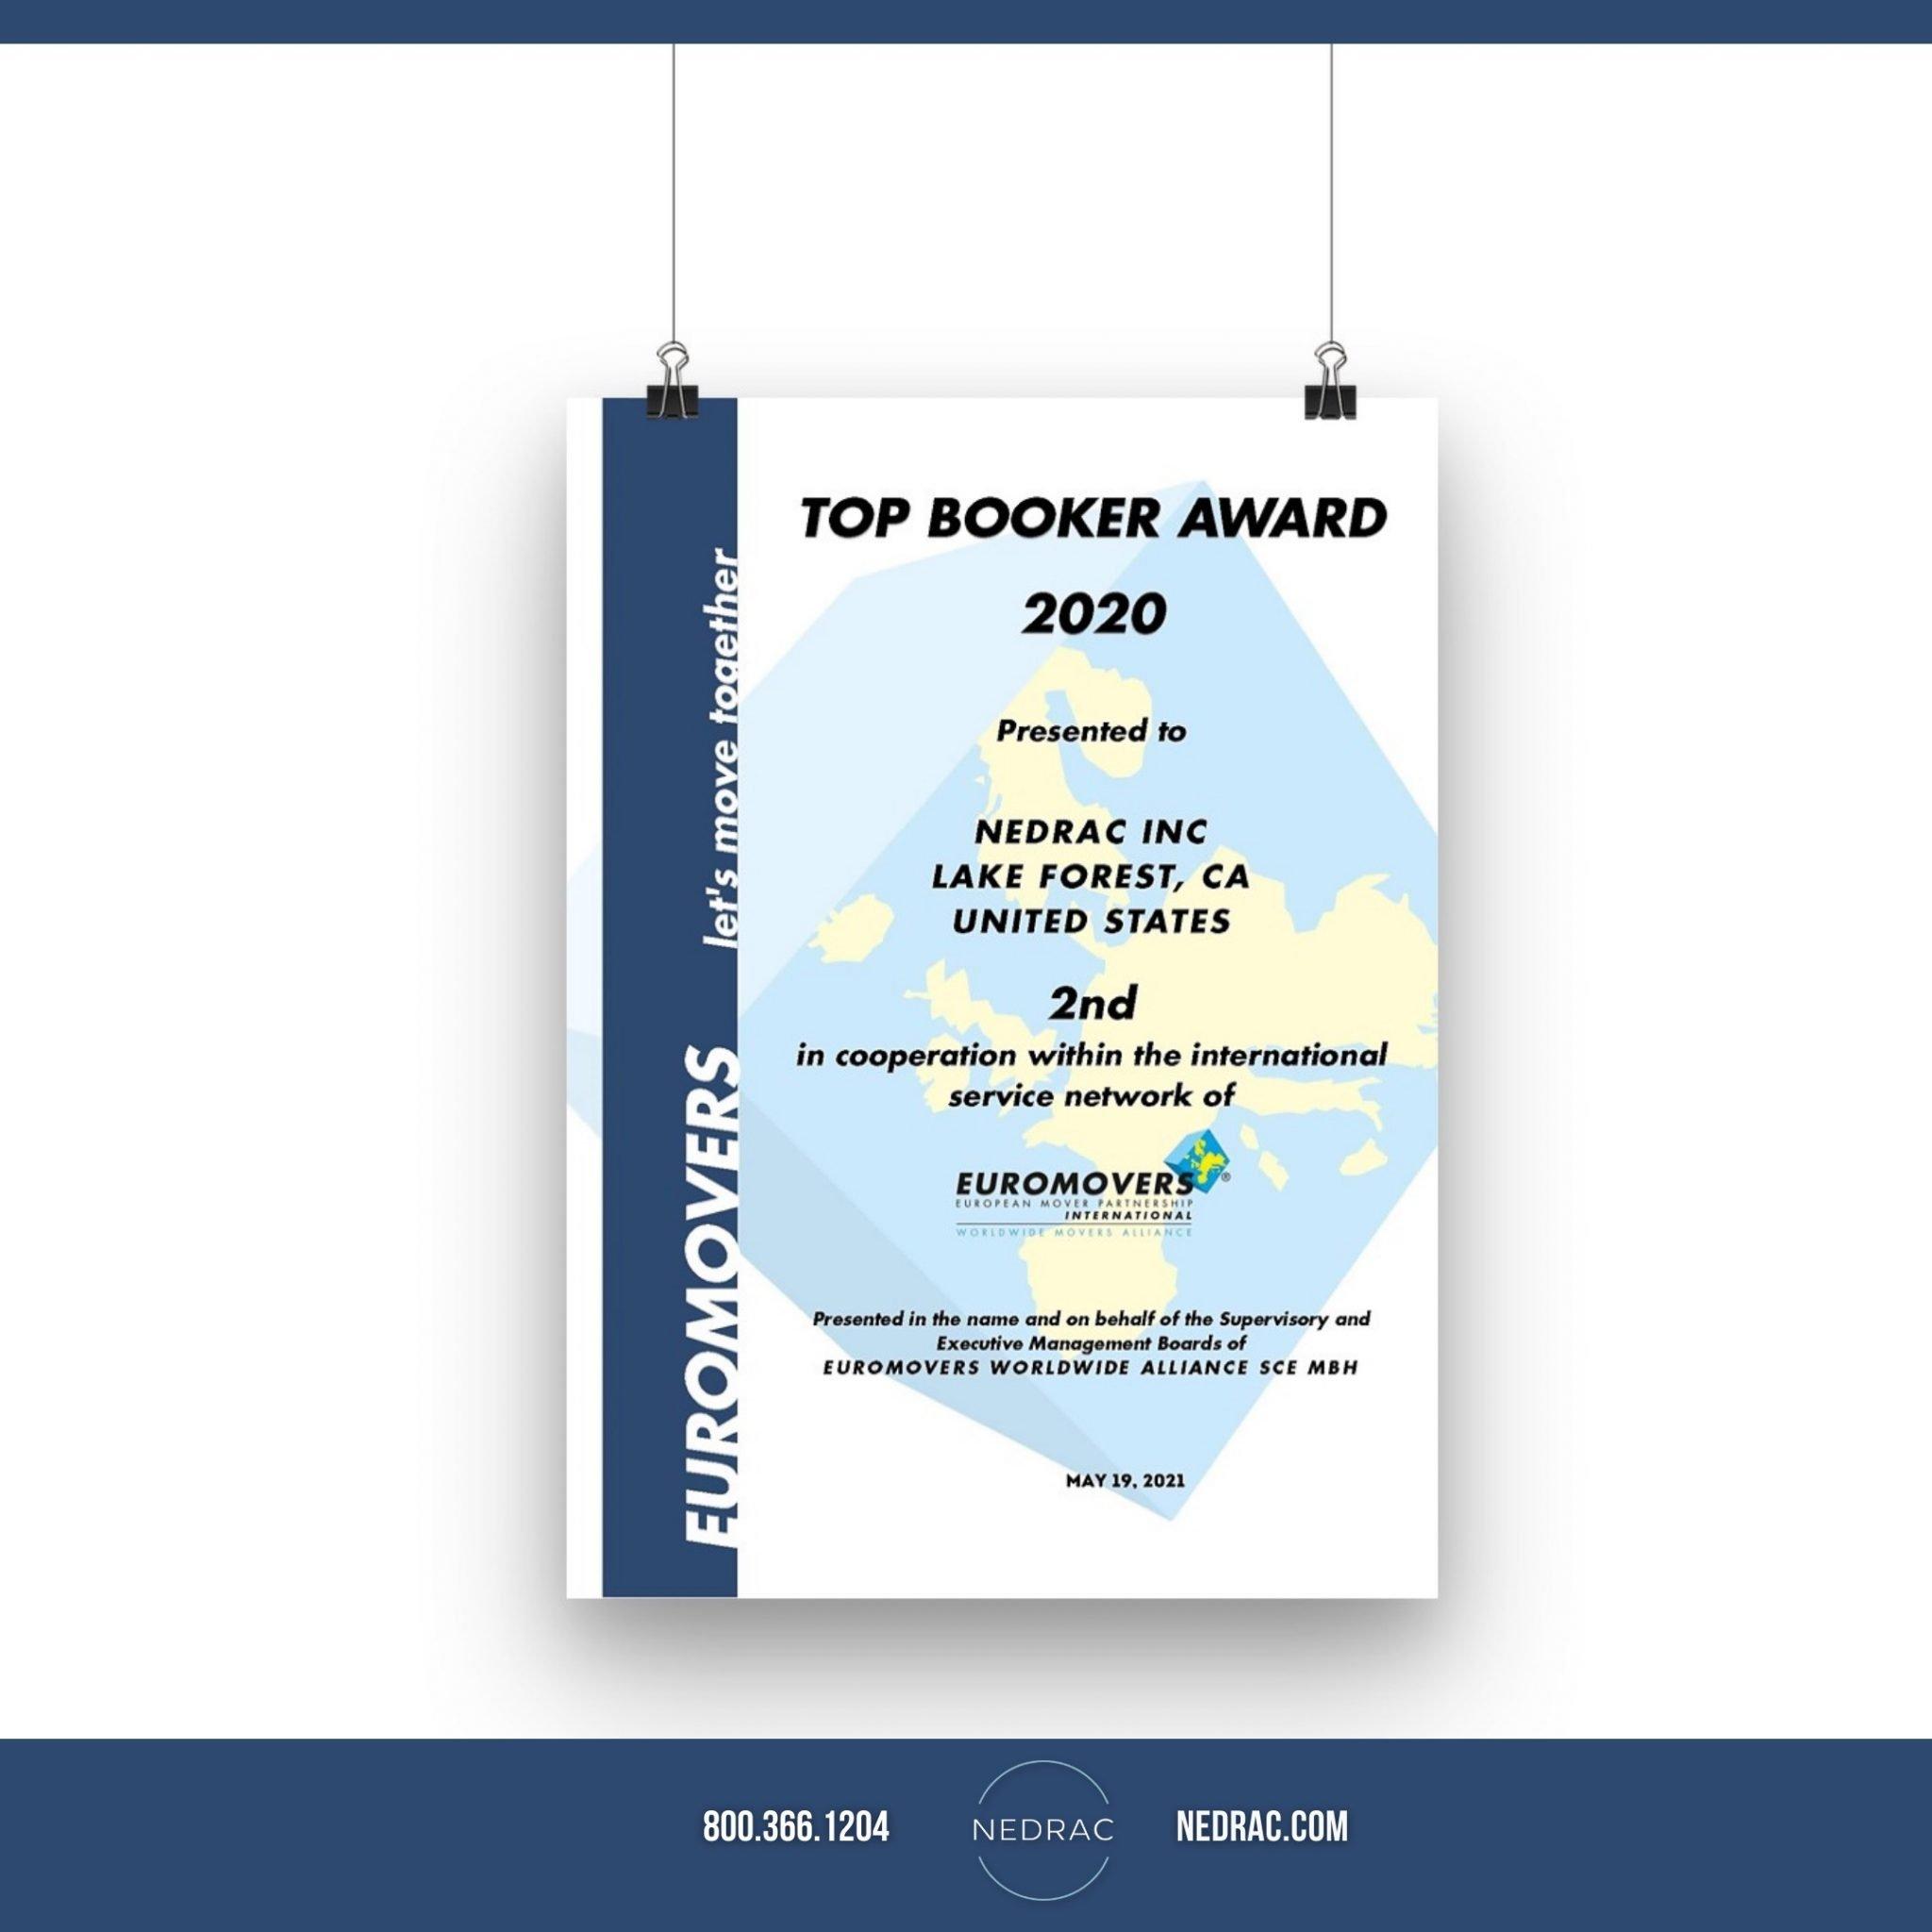 NEDRAC Receives EUROMOVERS Top Booker Award